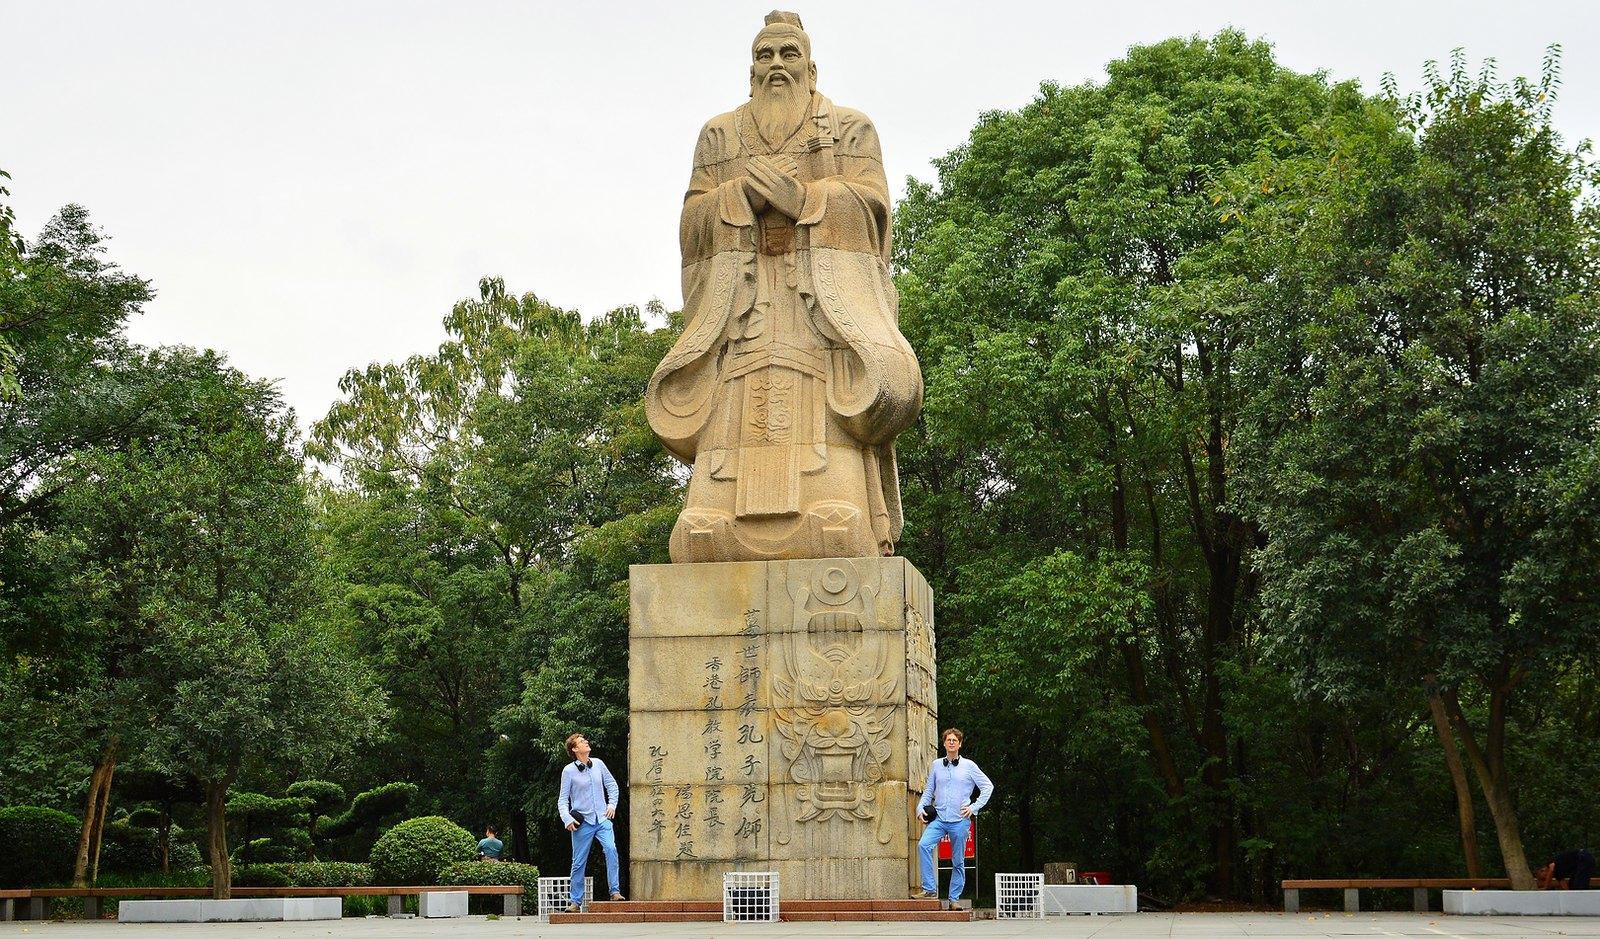 Confucius statue, Yueyang